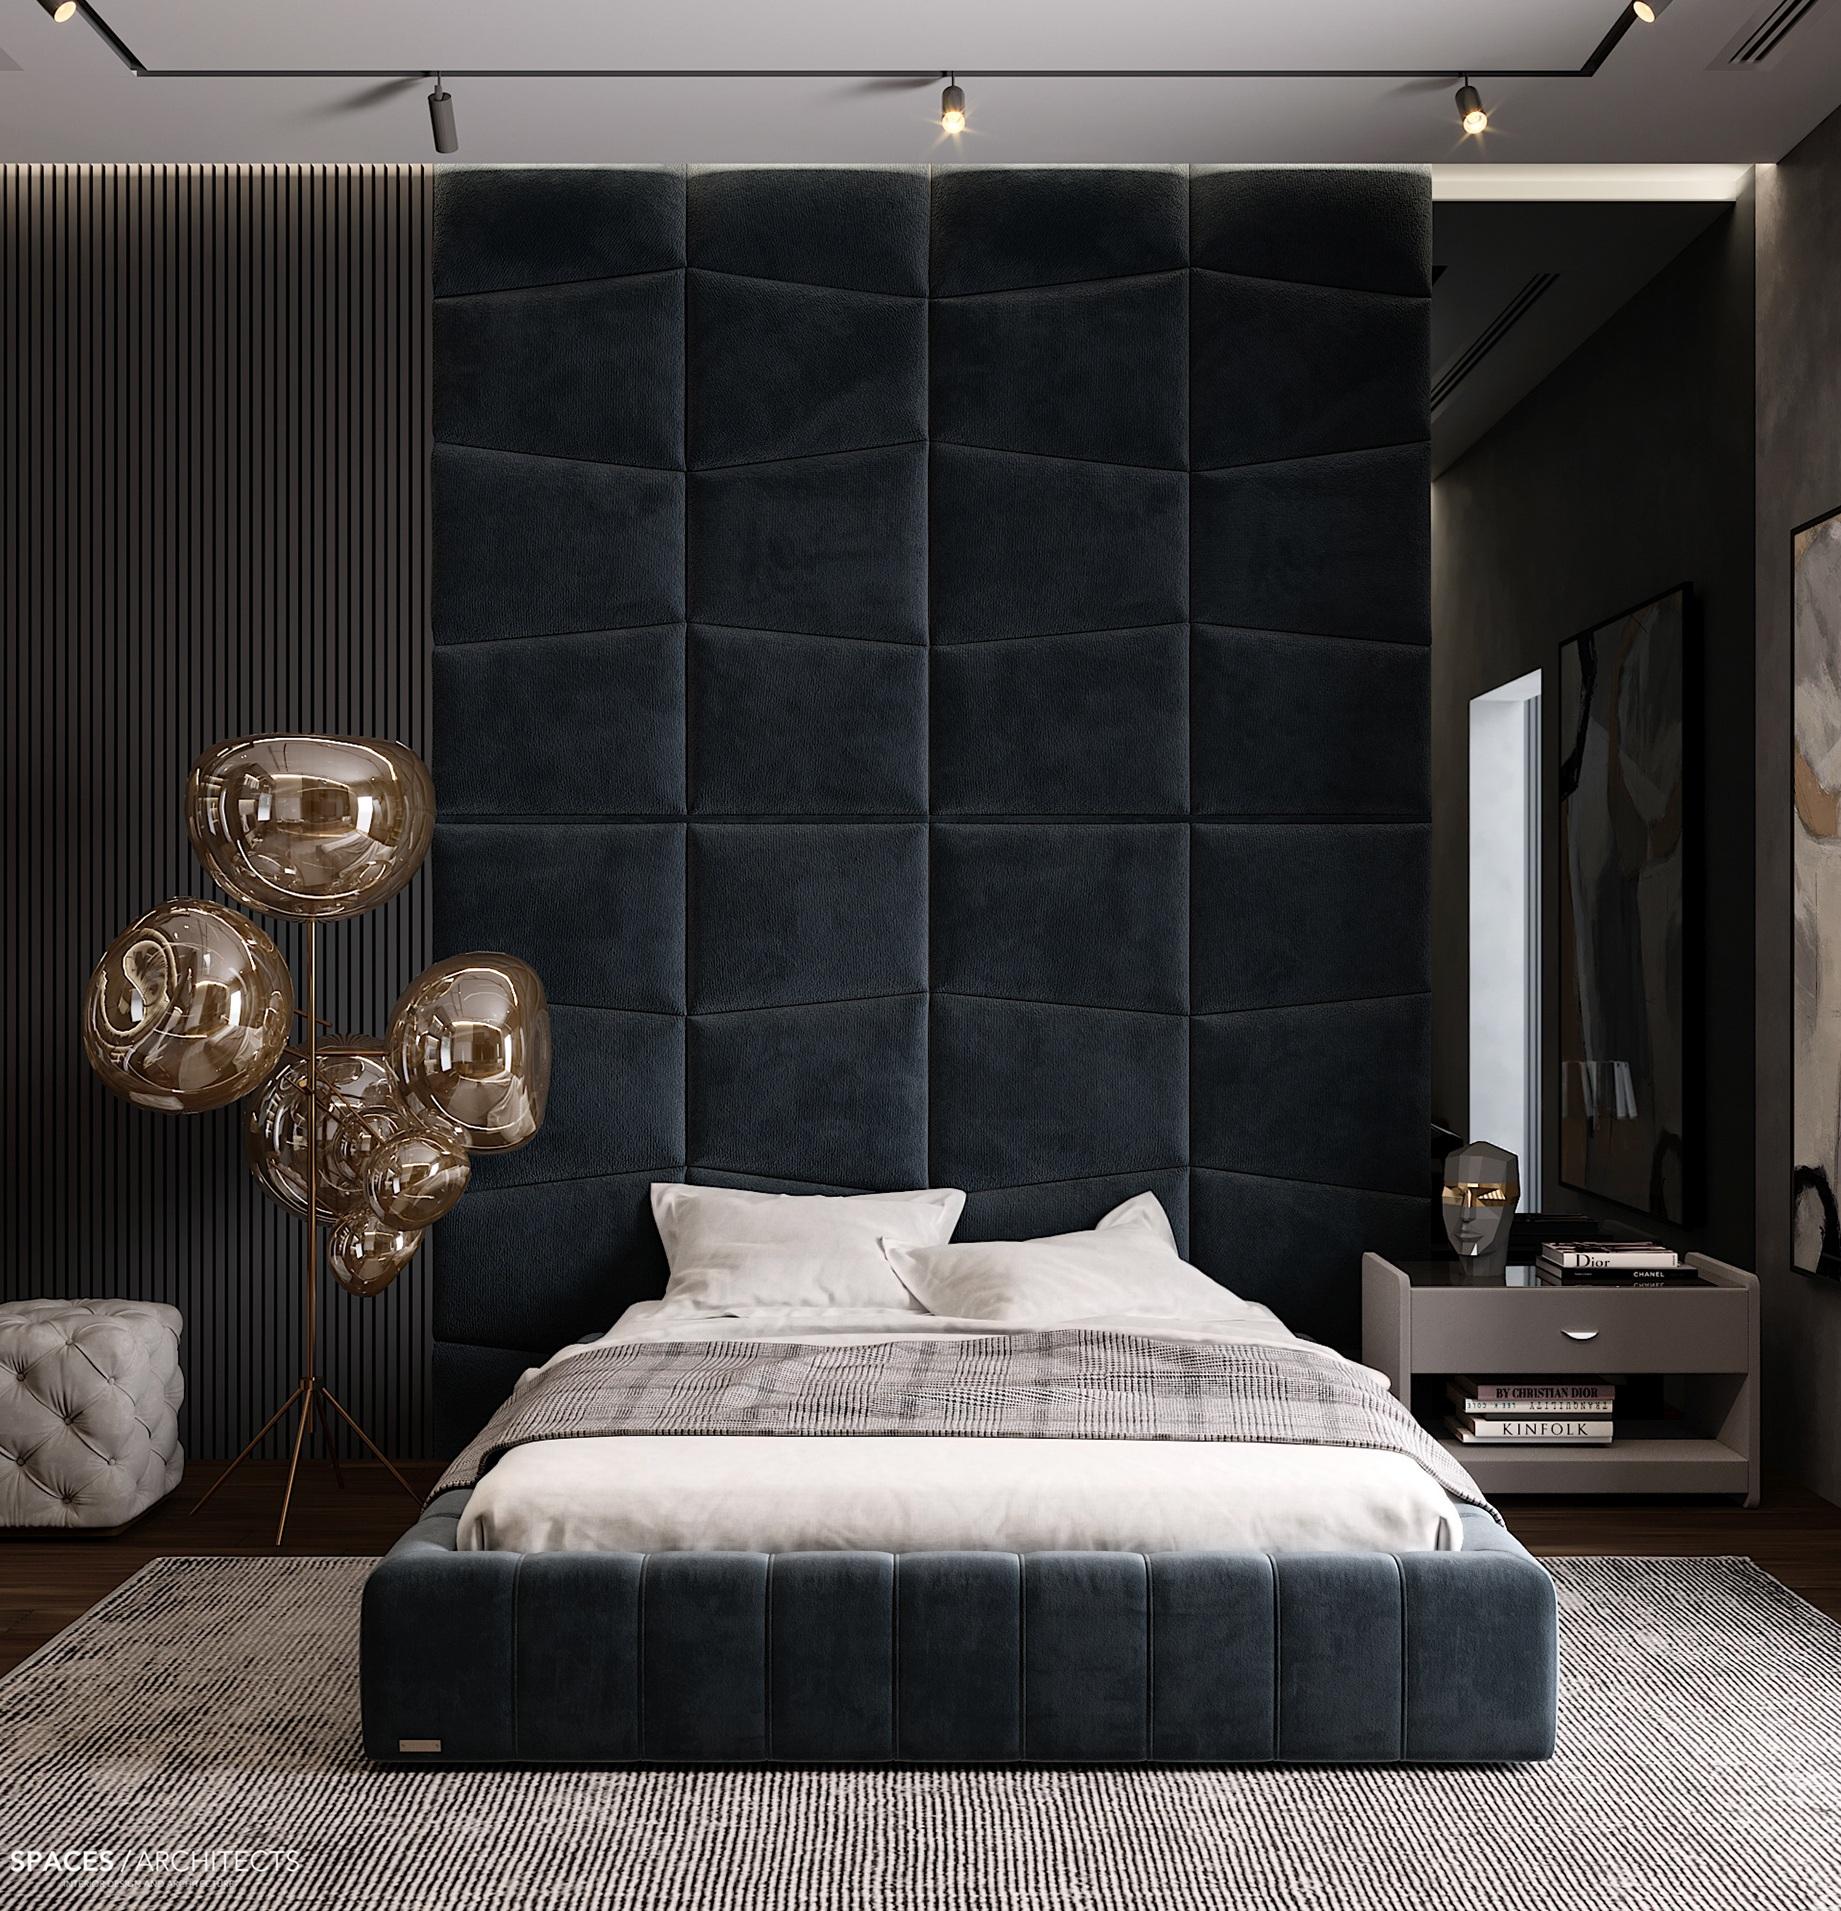 Amazing Velvety Blue Bedroom Ideas for You